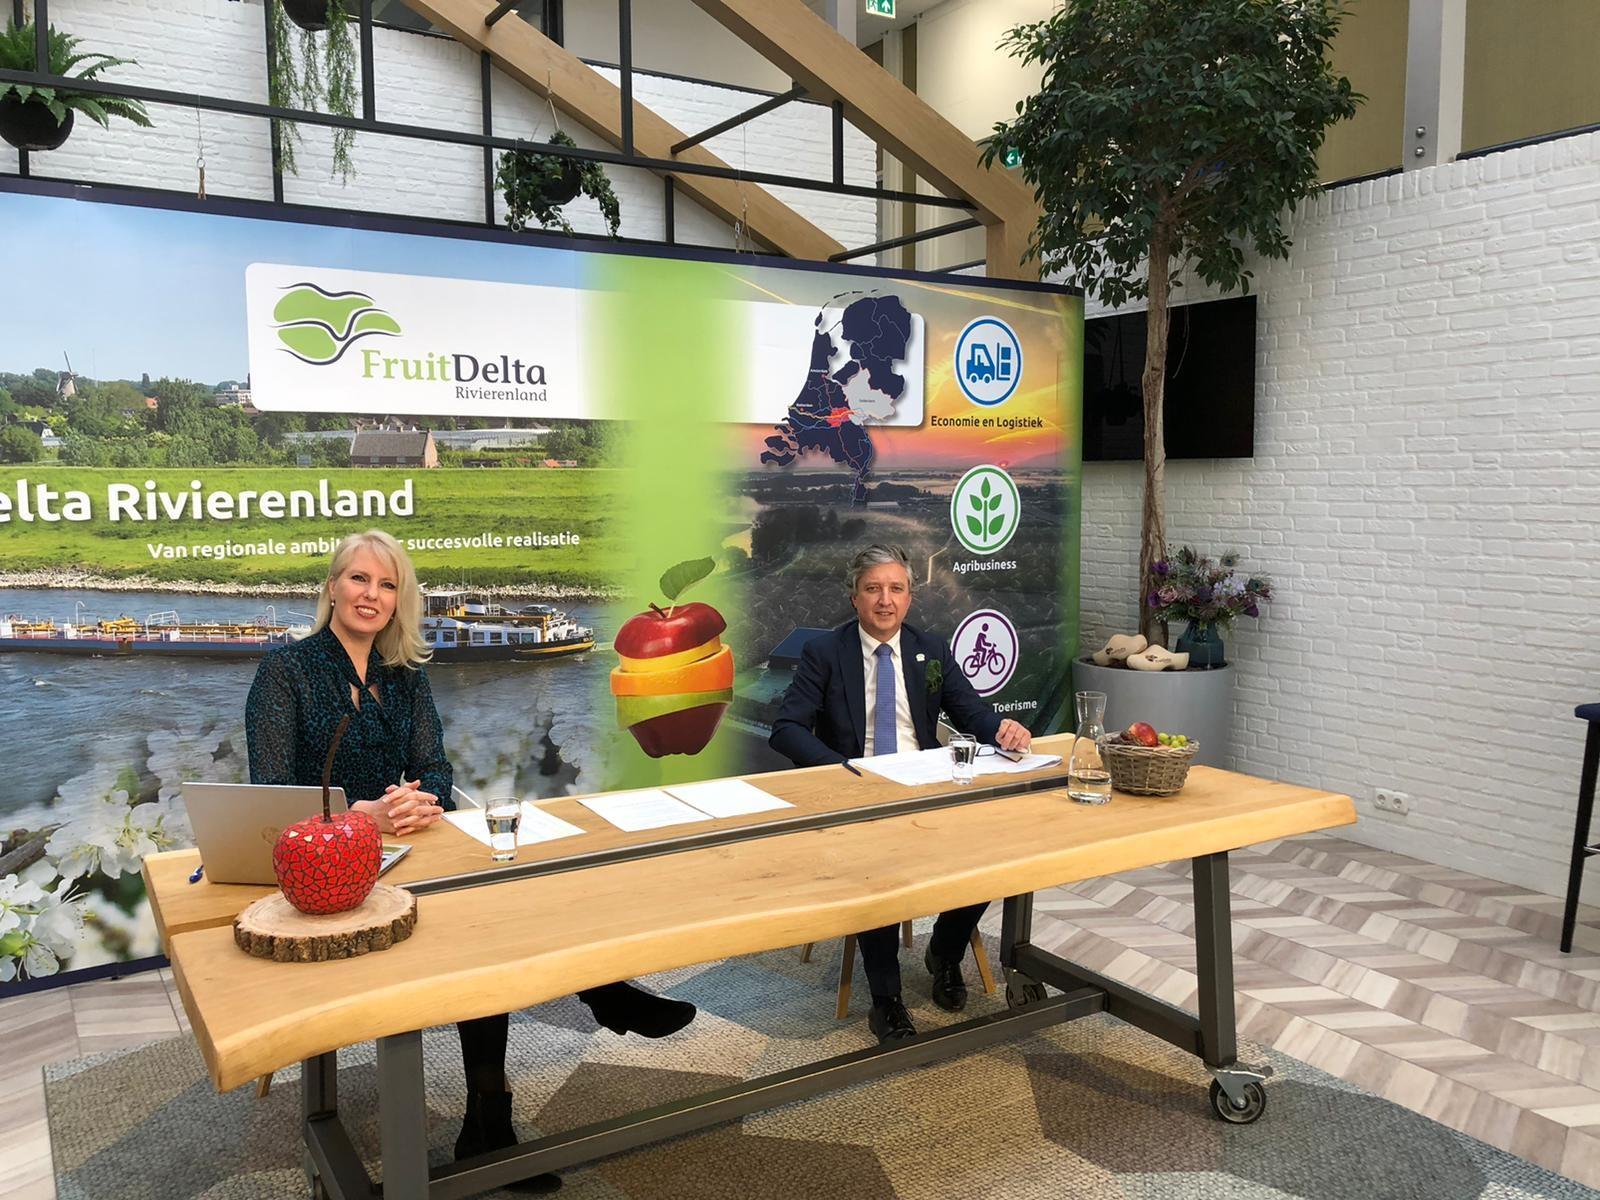 Webinar FruitDelta Rivierenland 29 januari 2021